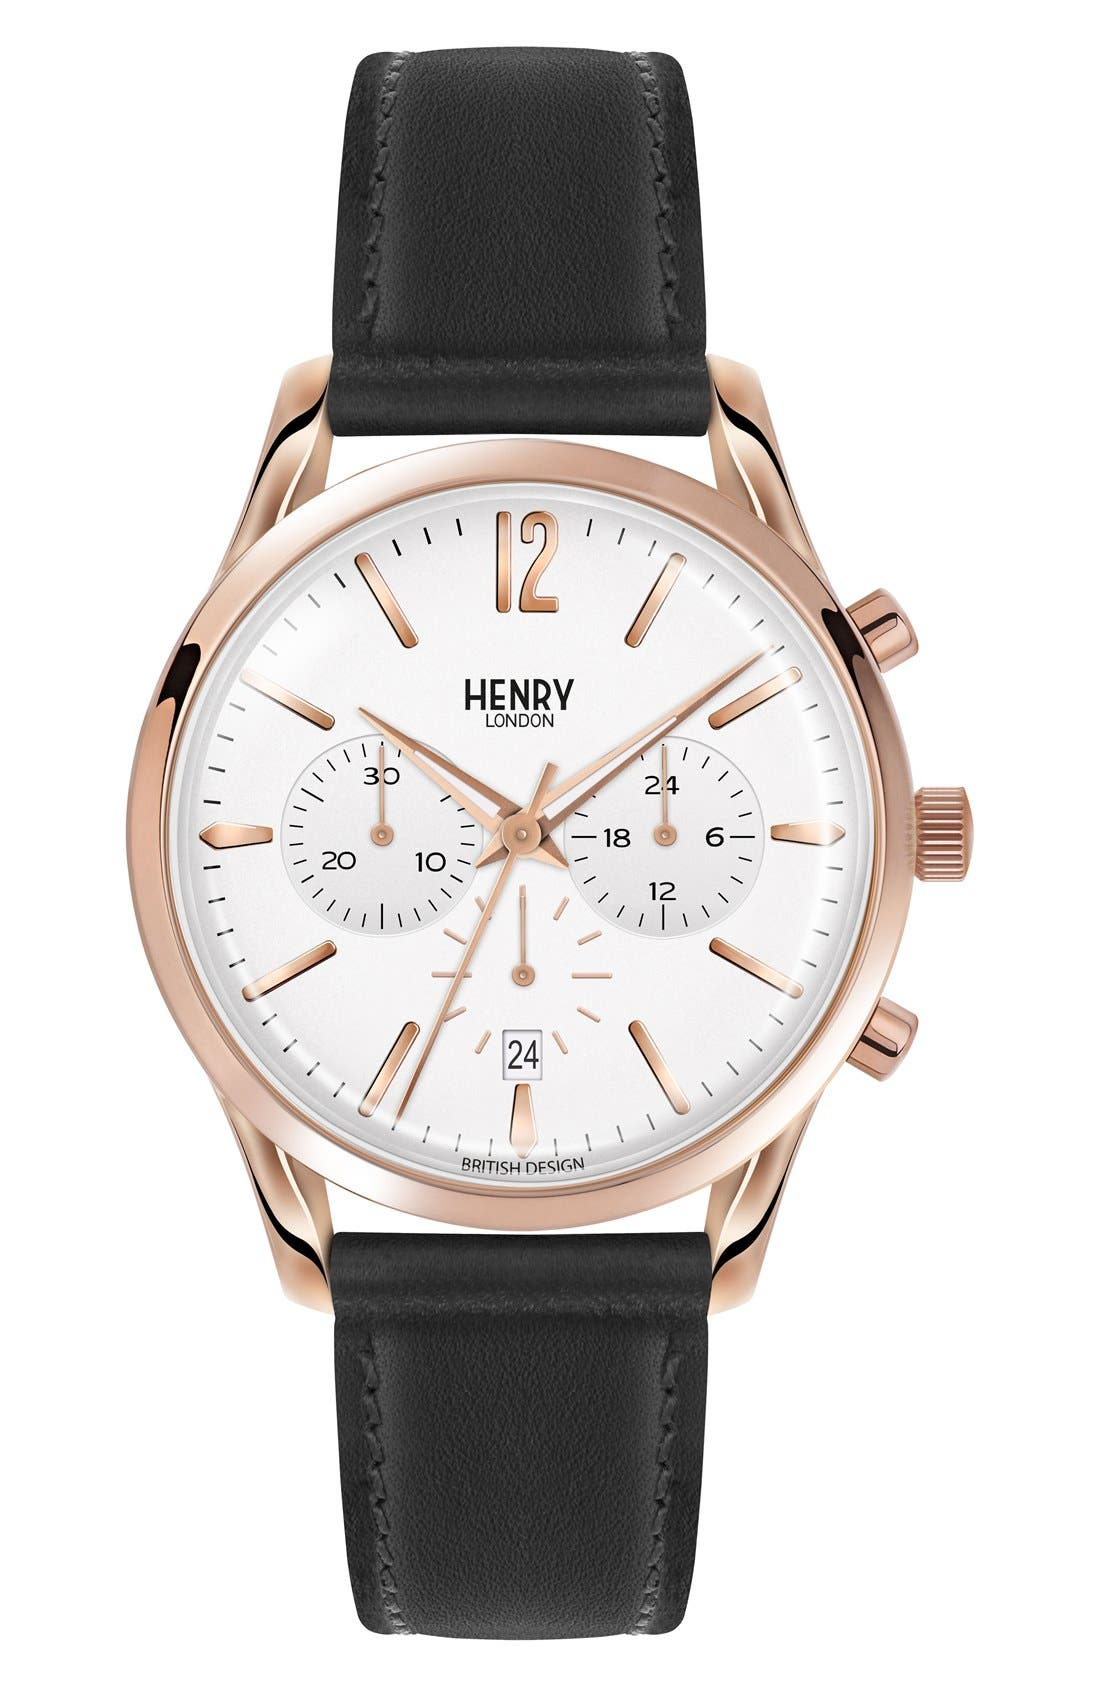 Main Image - Henry London Richmond Chronograph Leather Strap Watch, 39mm